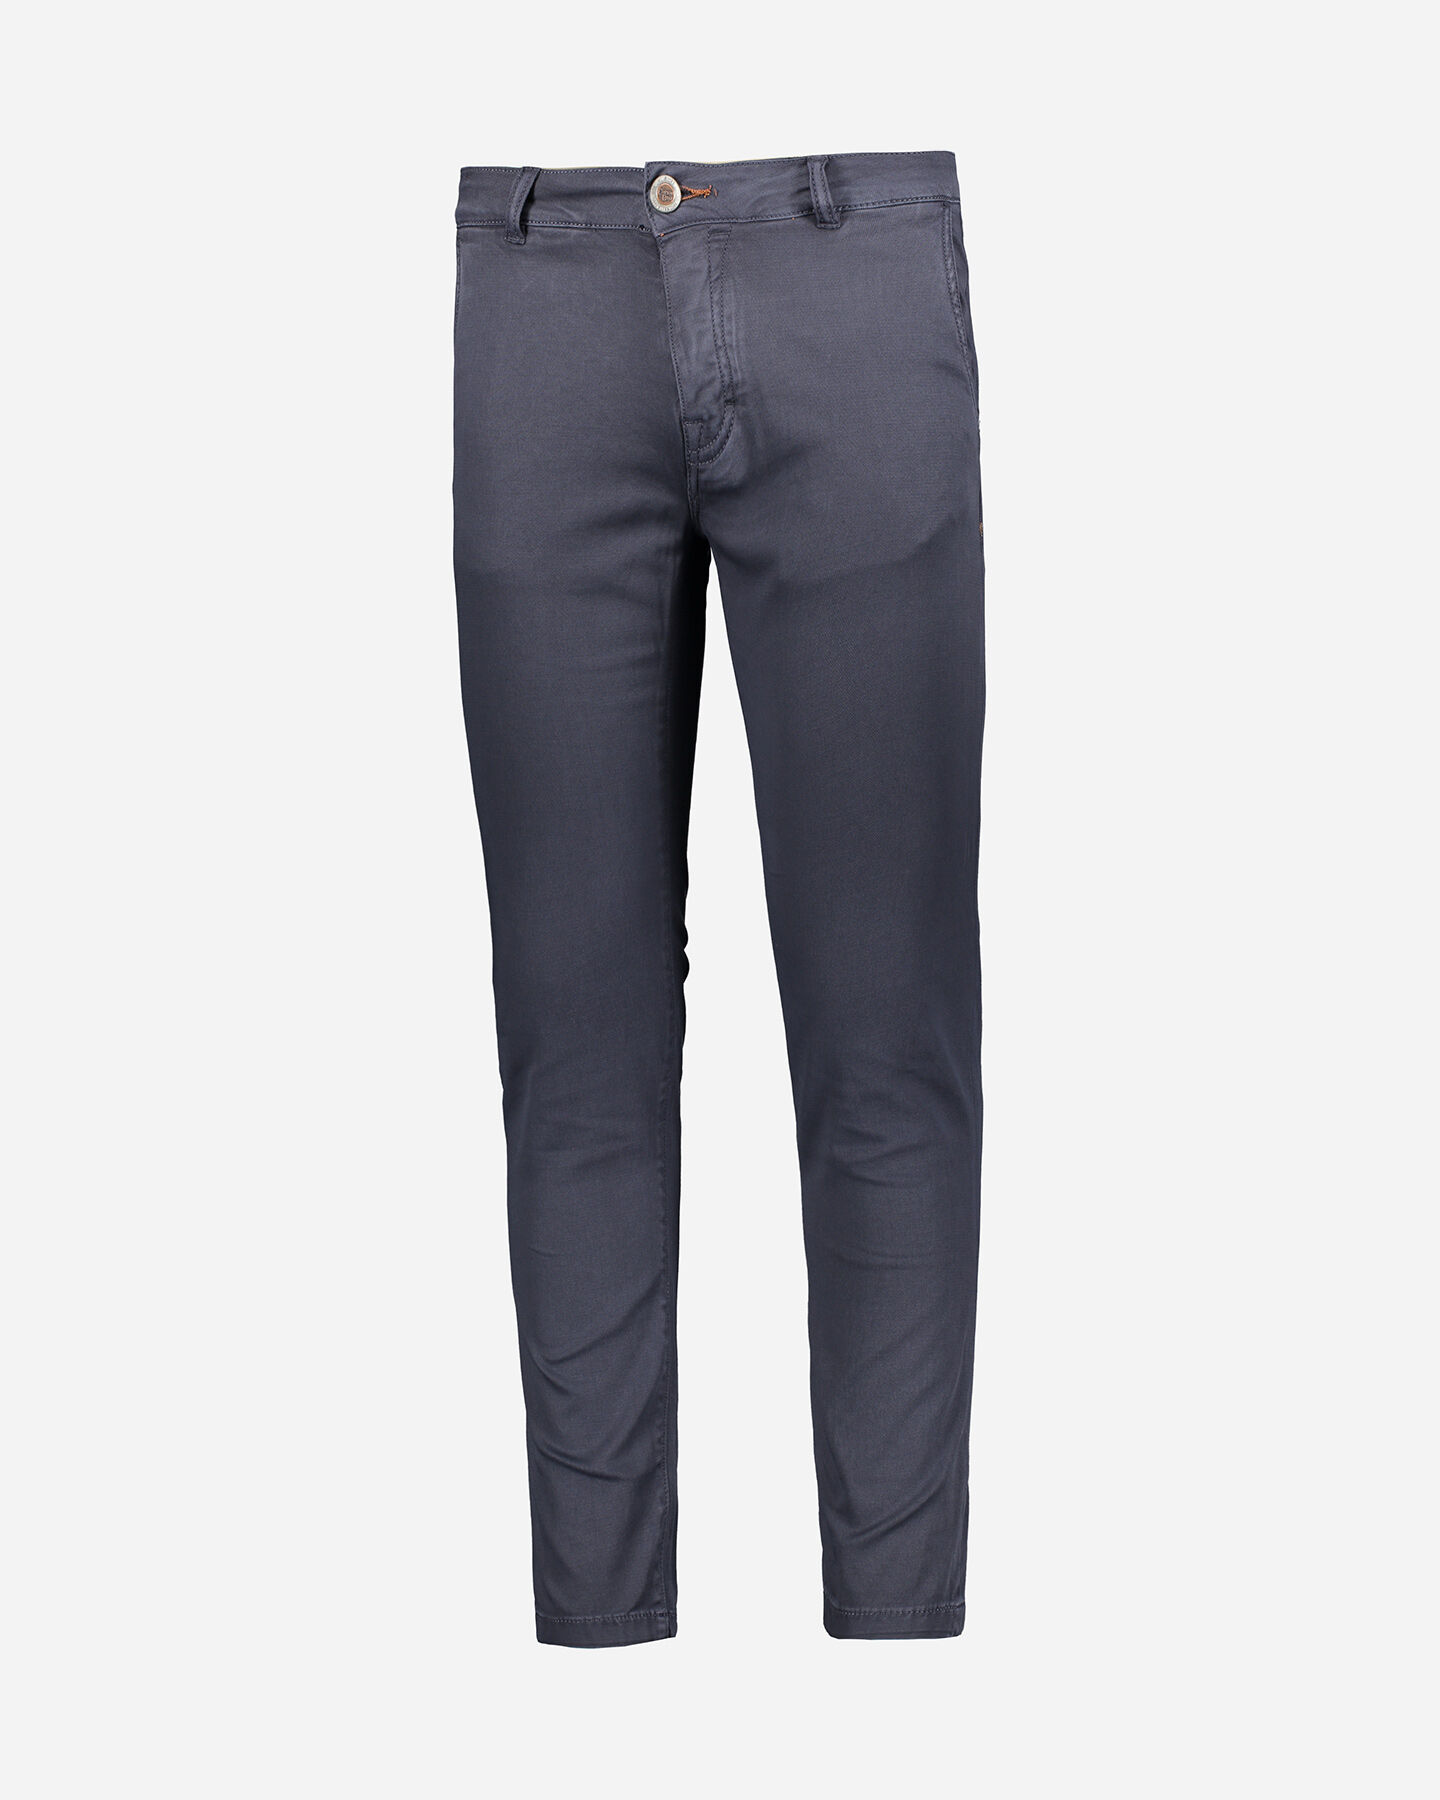 Pantalone COTTON BELT CHINO SLIM M S4076641 scatto 4